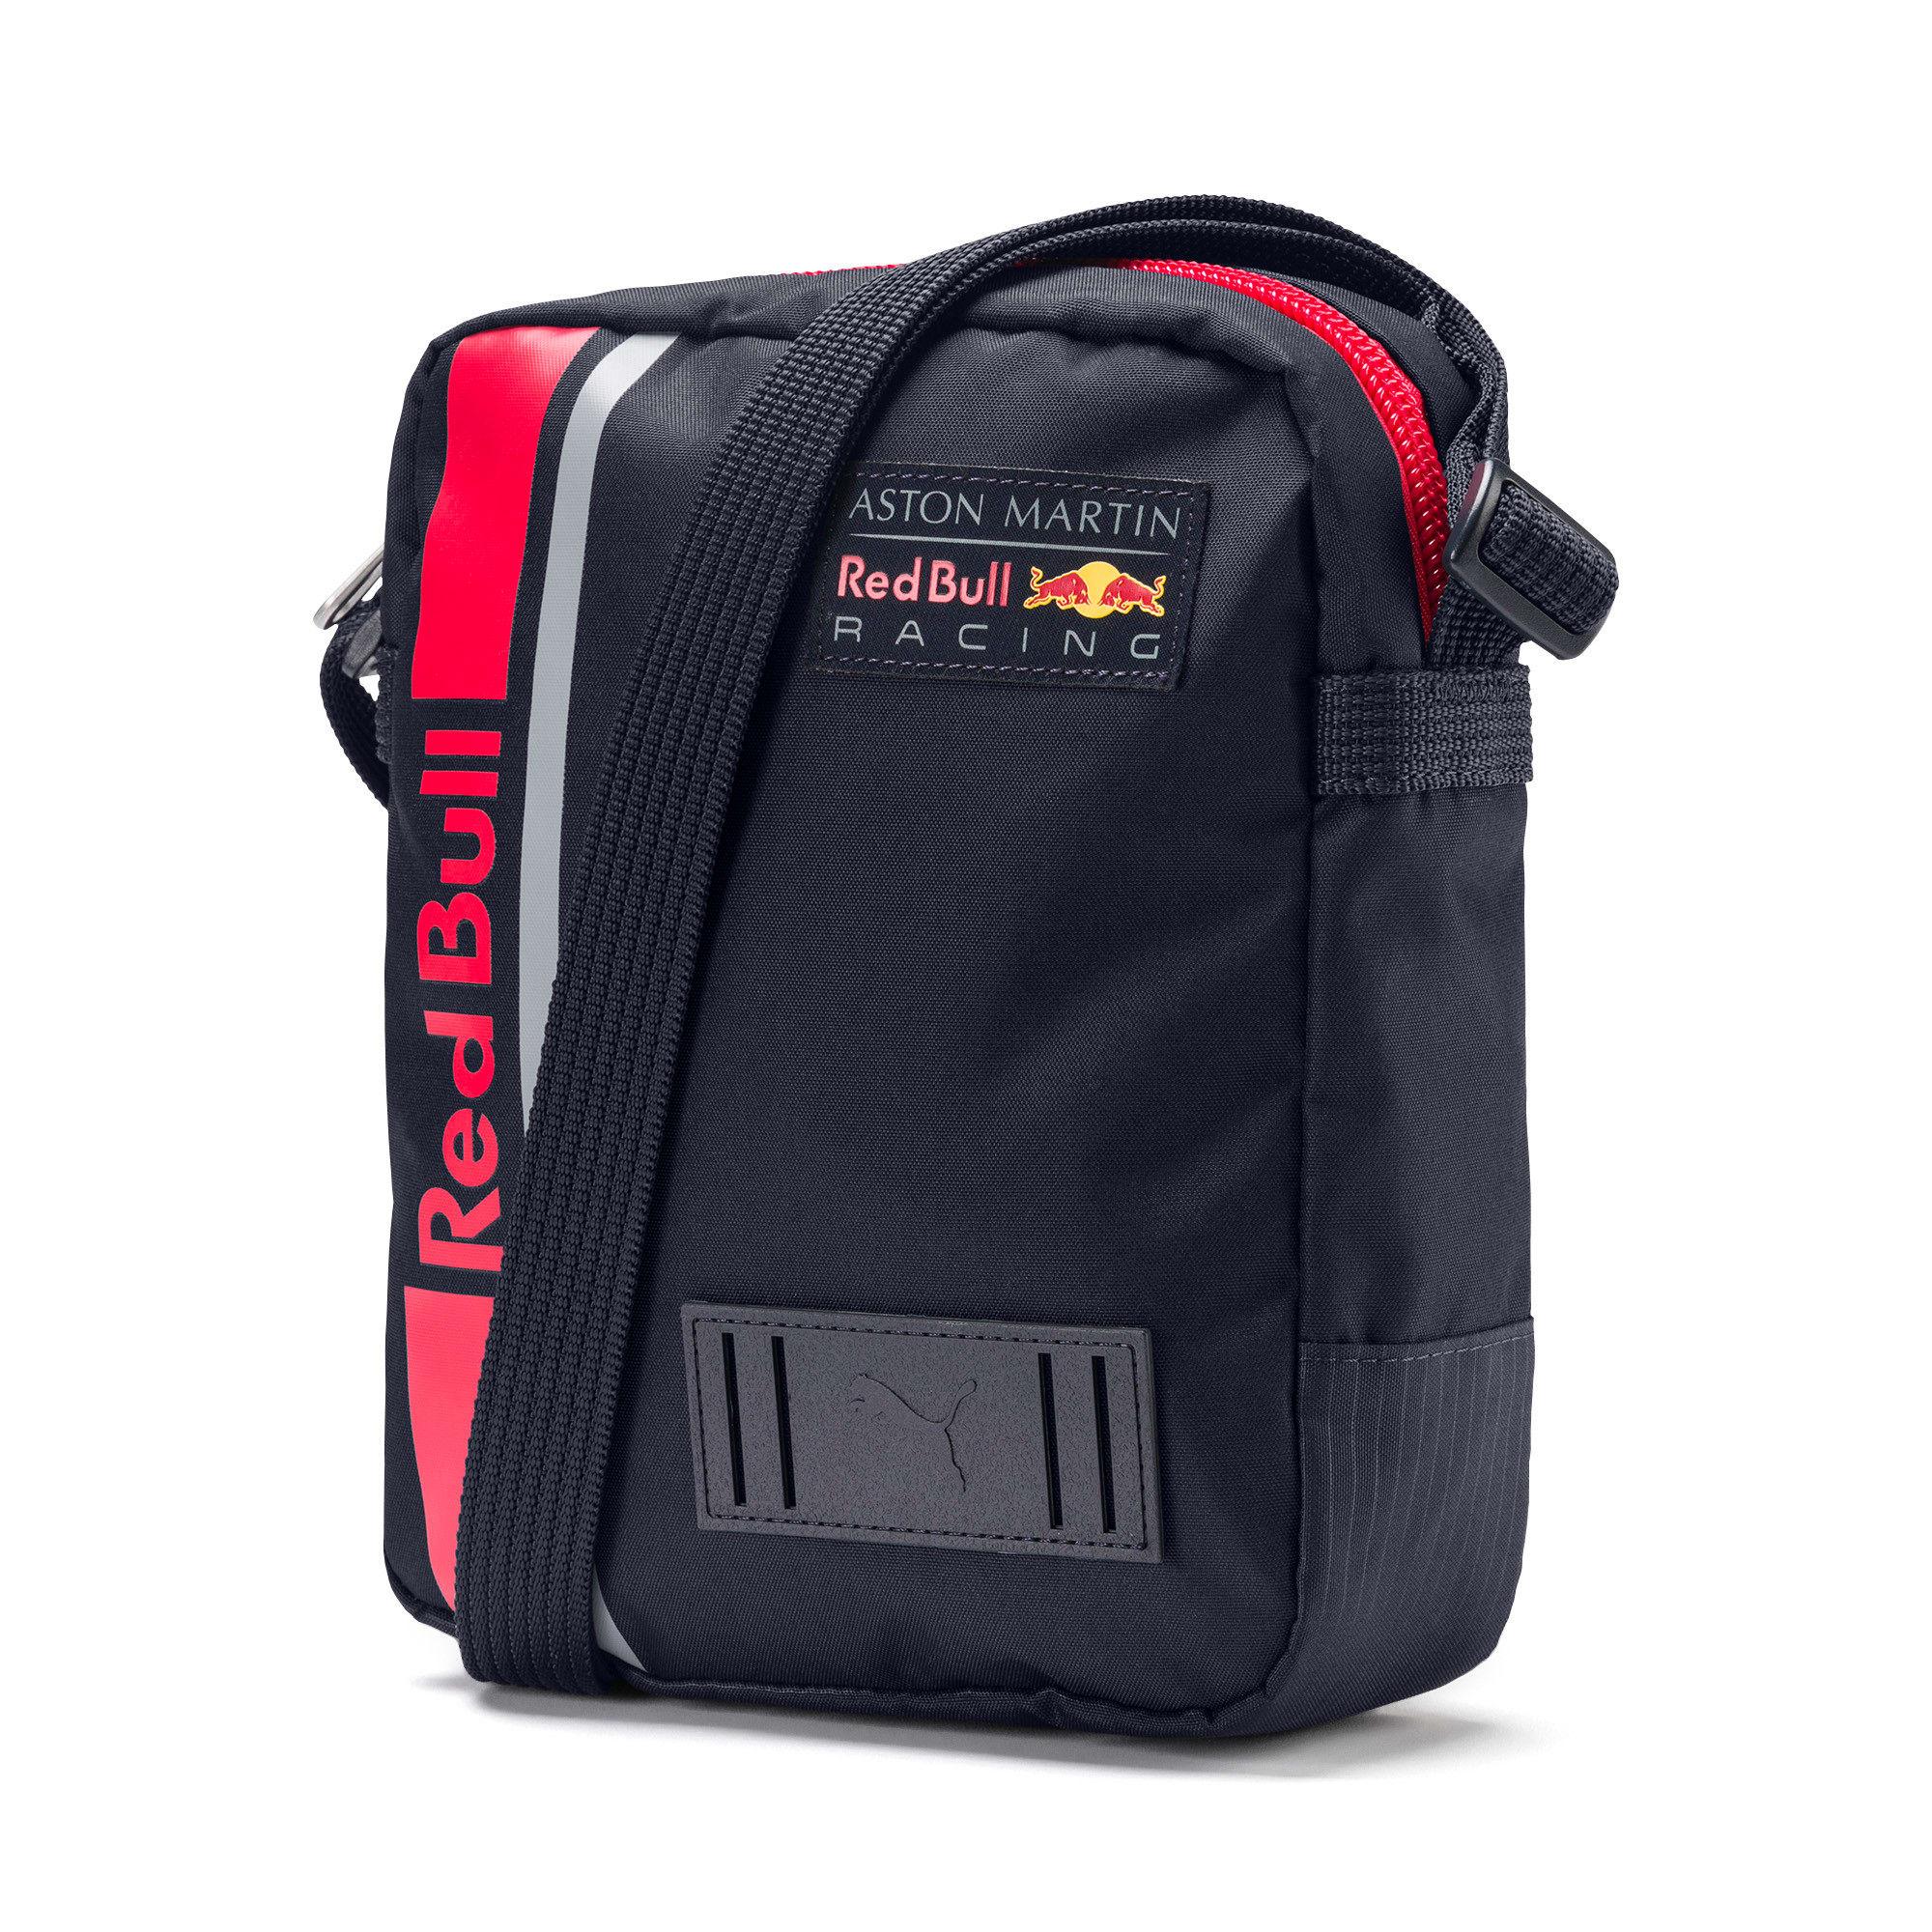 Thumbnail 1 of AM Red Bull Racing Replica Portable Bag, NIGHT SKY, medium